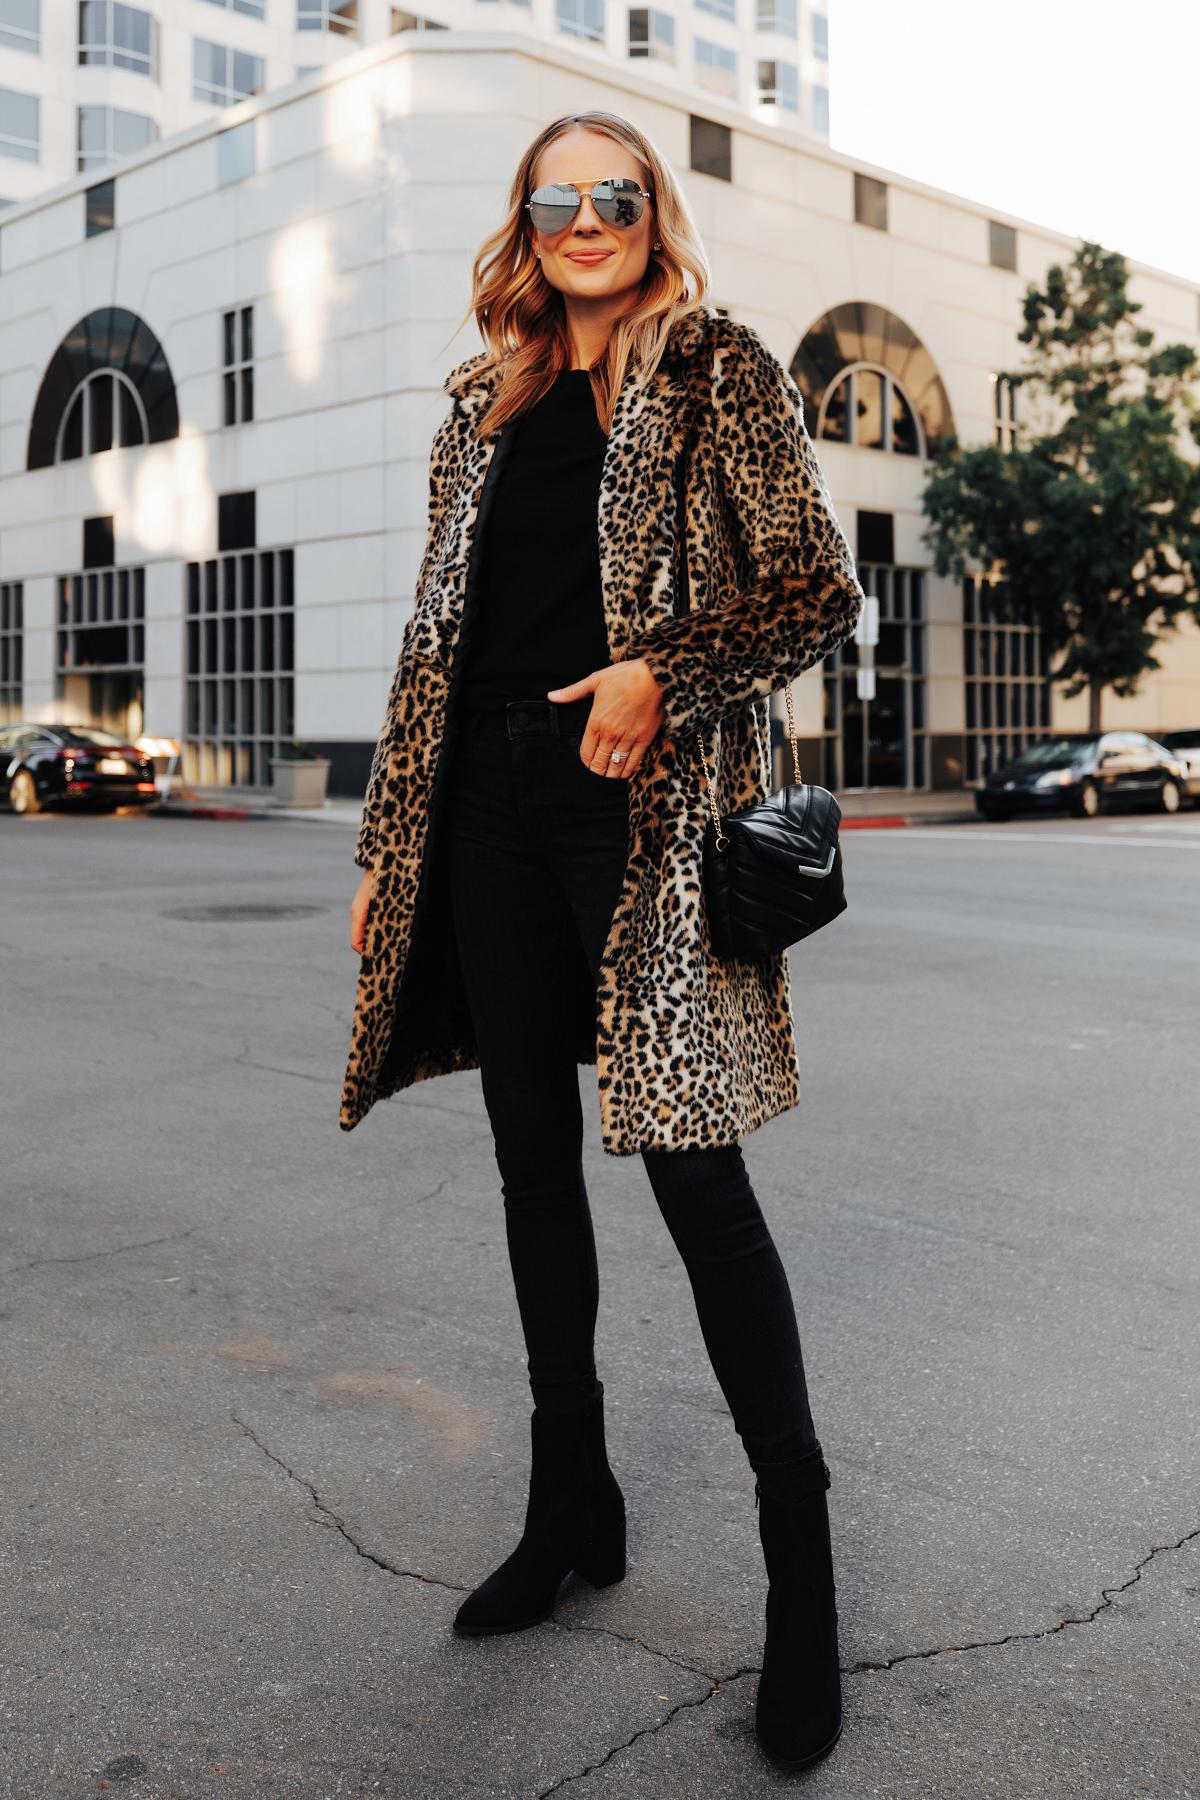 Fashion Jackson Wearing Express Faux Fur Leopard Coat Black Sweater Black Jeans Black Booties 1